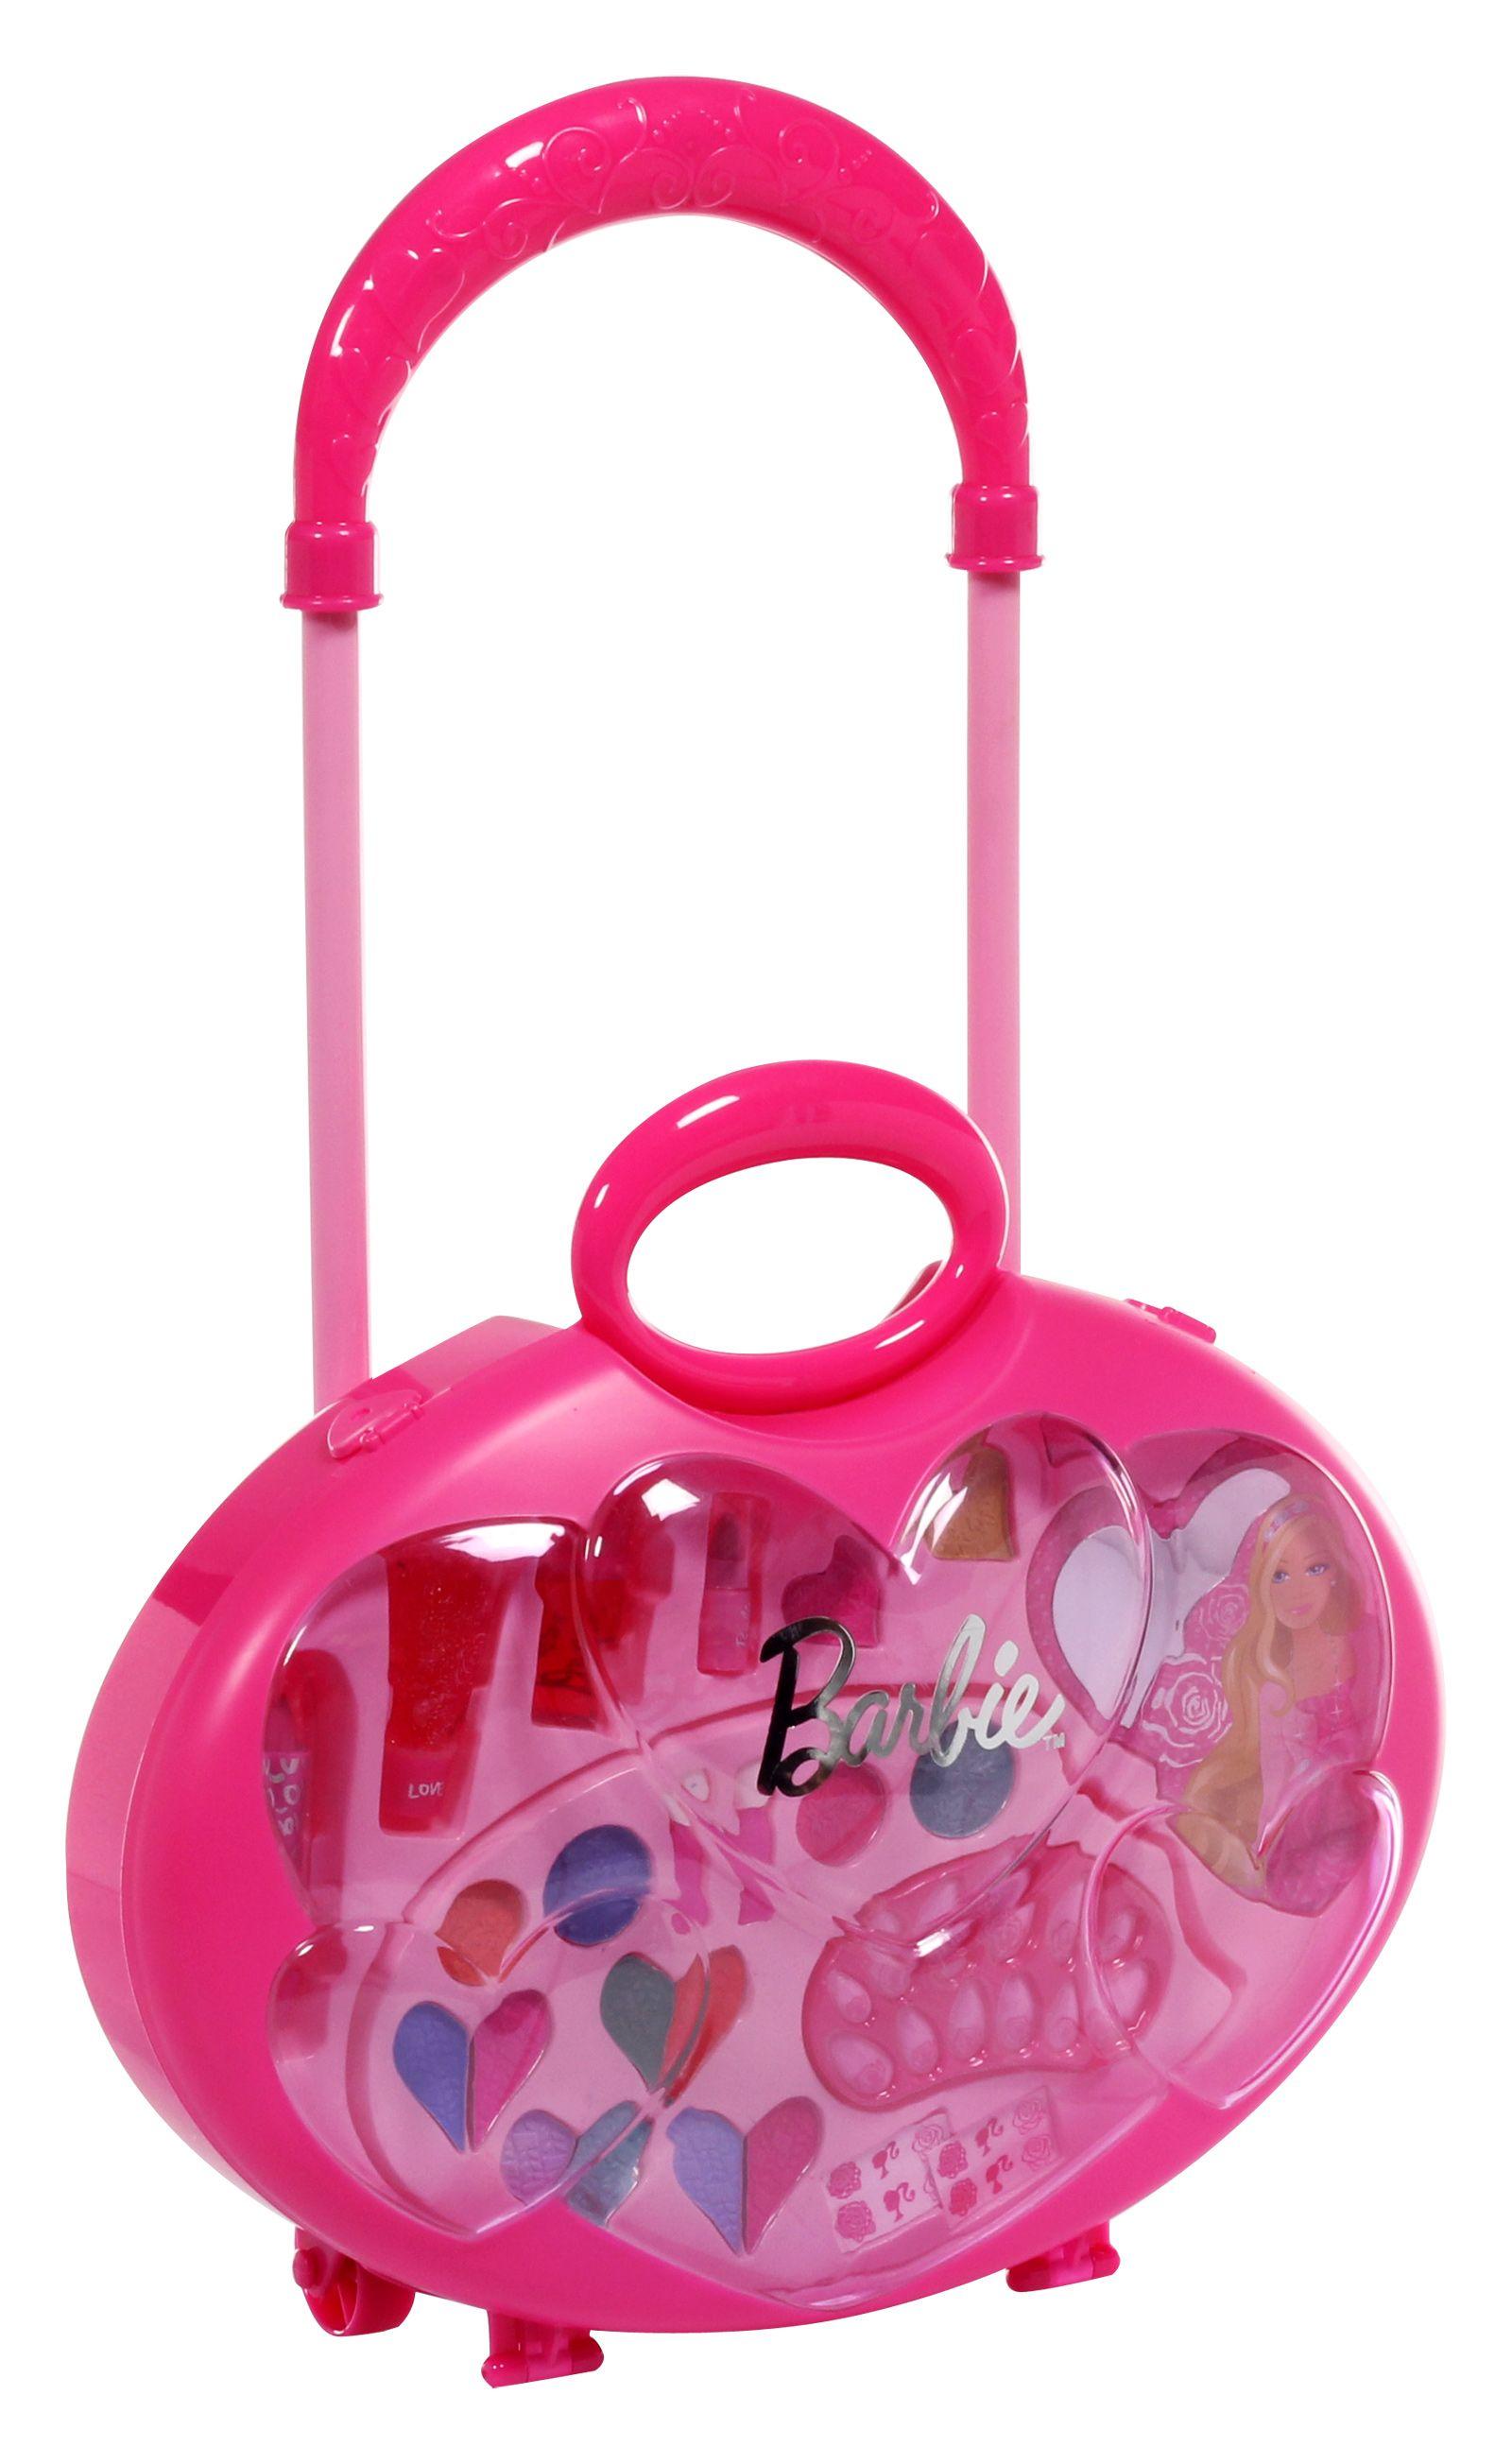 BARBIE Beauty Train CASE! Makeup! Nail Polish! Shimmer ...  |Barbie Makeup Kit For Kids